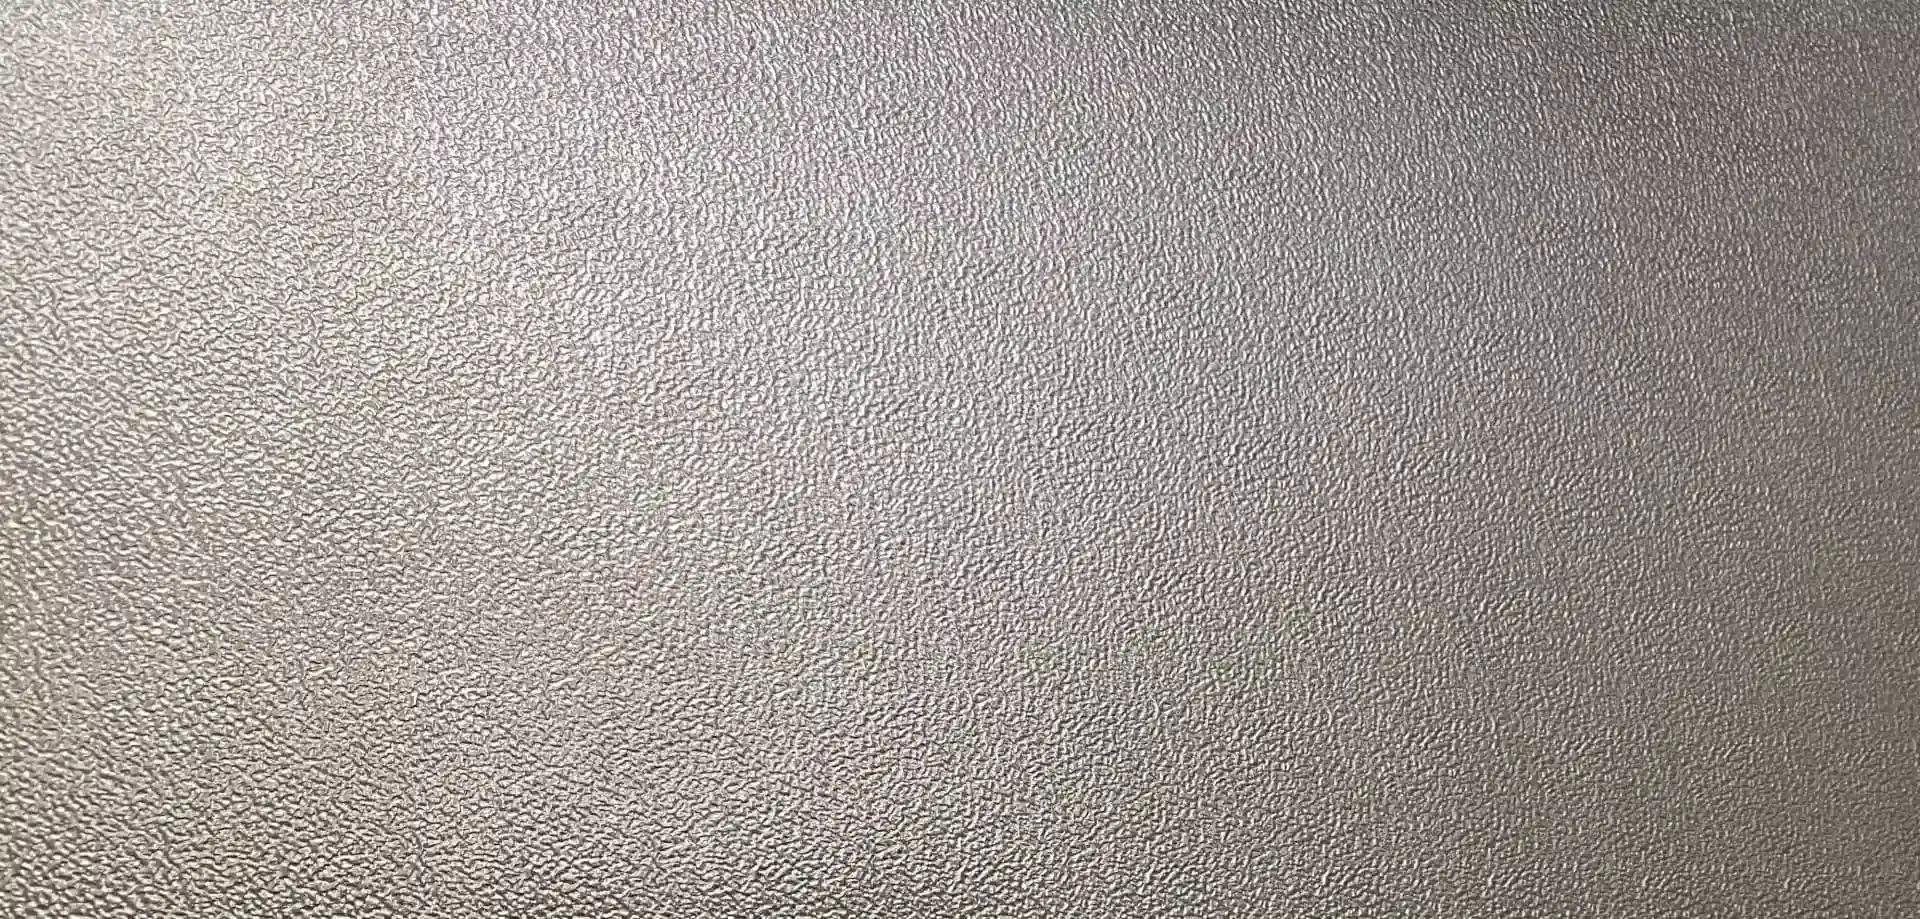 Aluminium Stucco Embossed Sheets